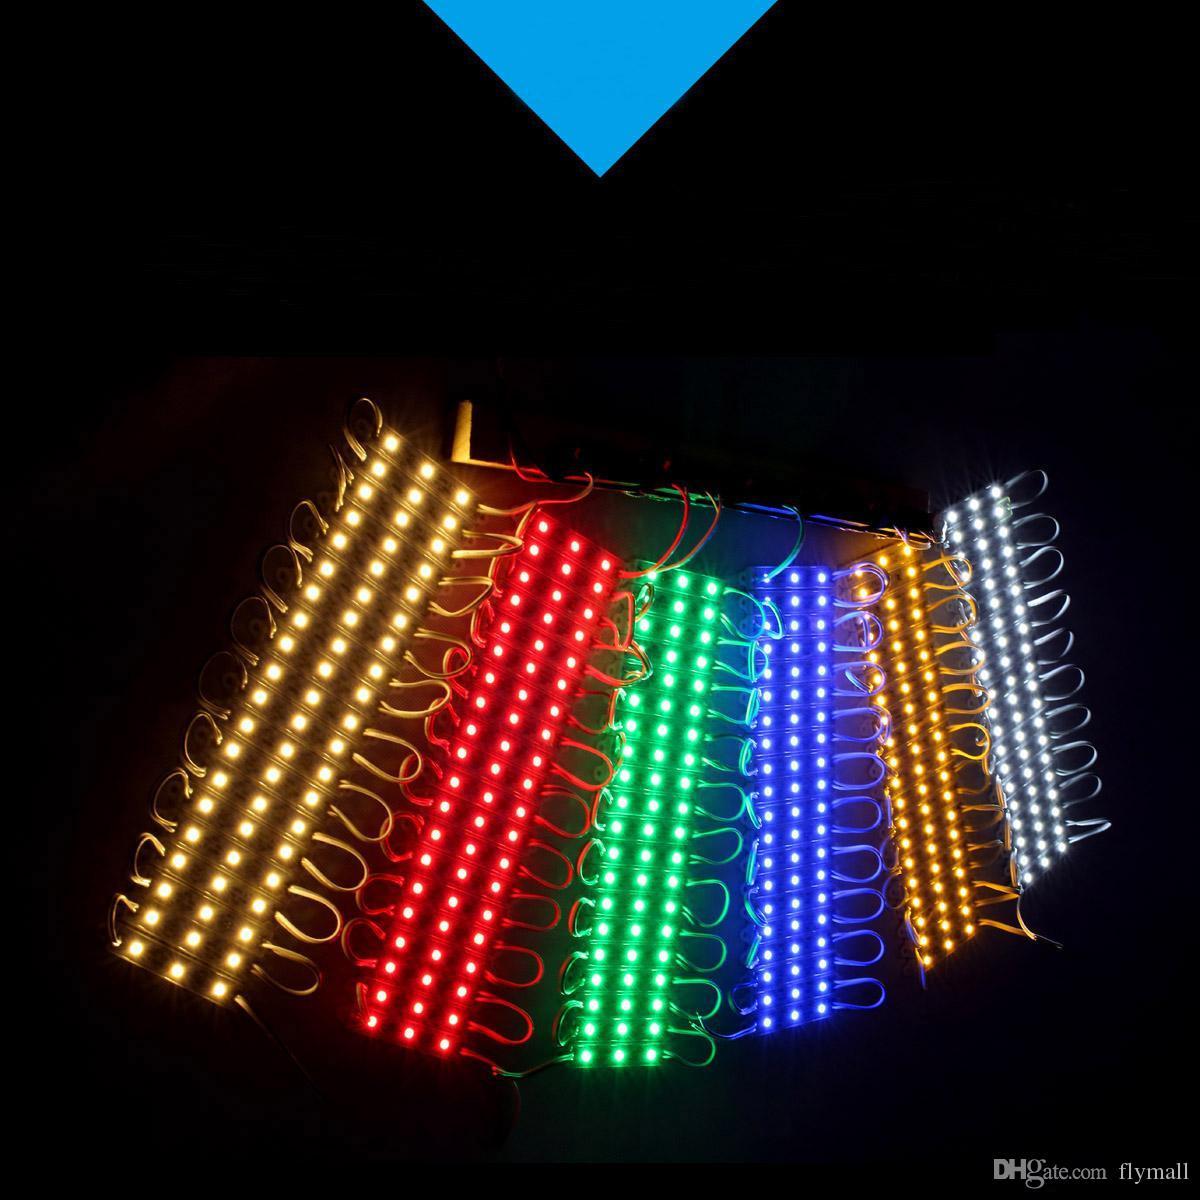 LED 조명 모듈 방수 Superbright SMD5630 LED 모듈 빛, 쿨 화이트 / 따뜻한 화이트 / 레드 / 옐로우 / 블루 / 그린, DC12V, 고품질 LED